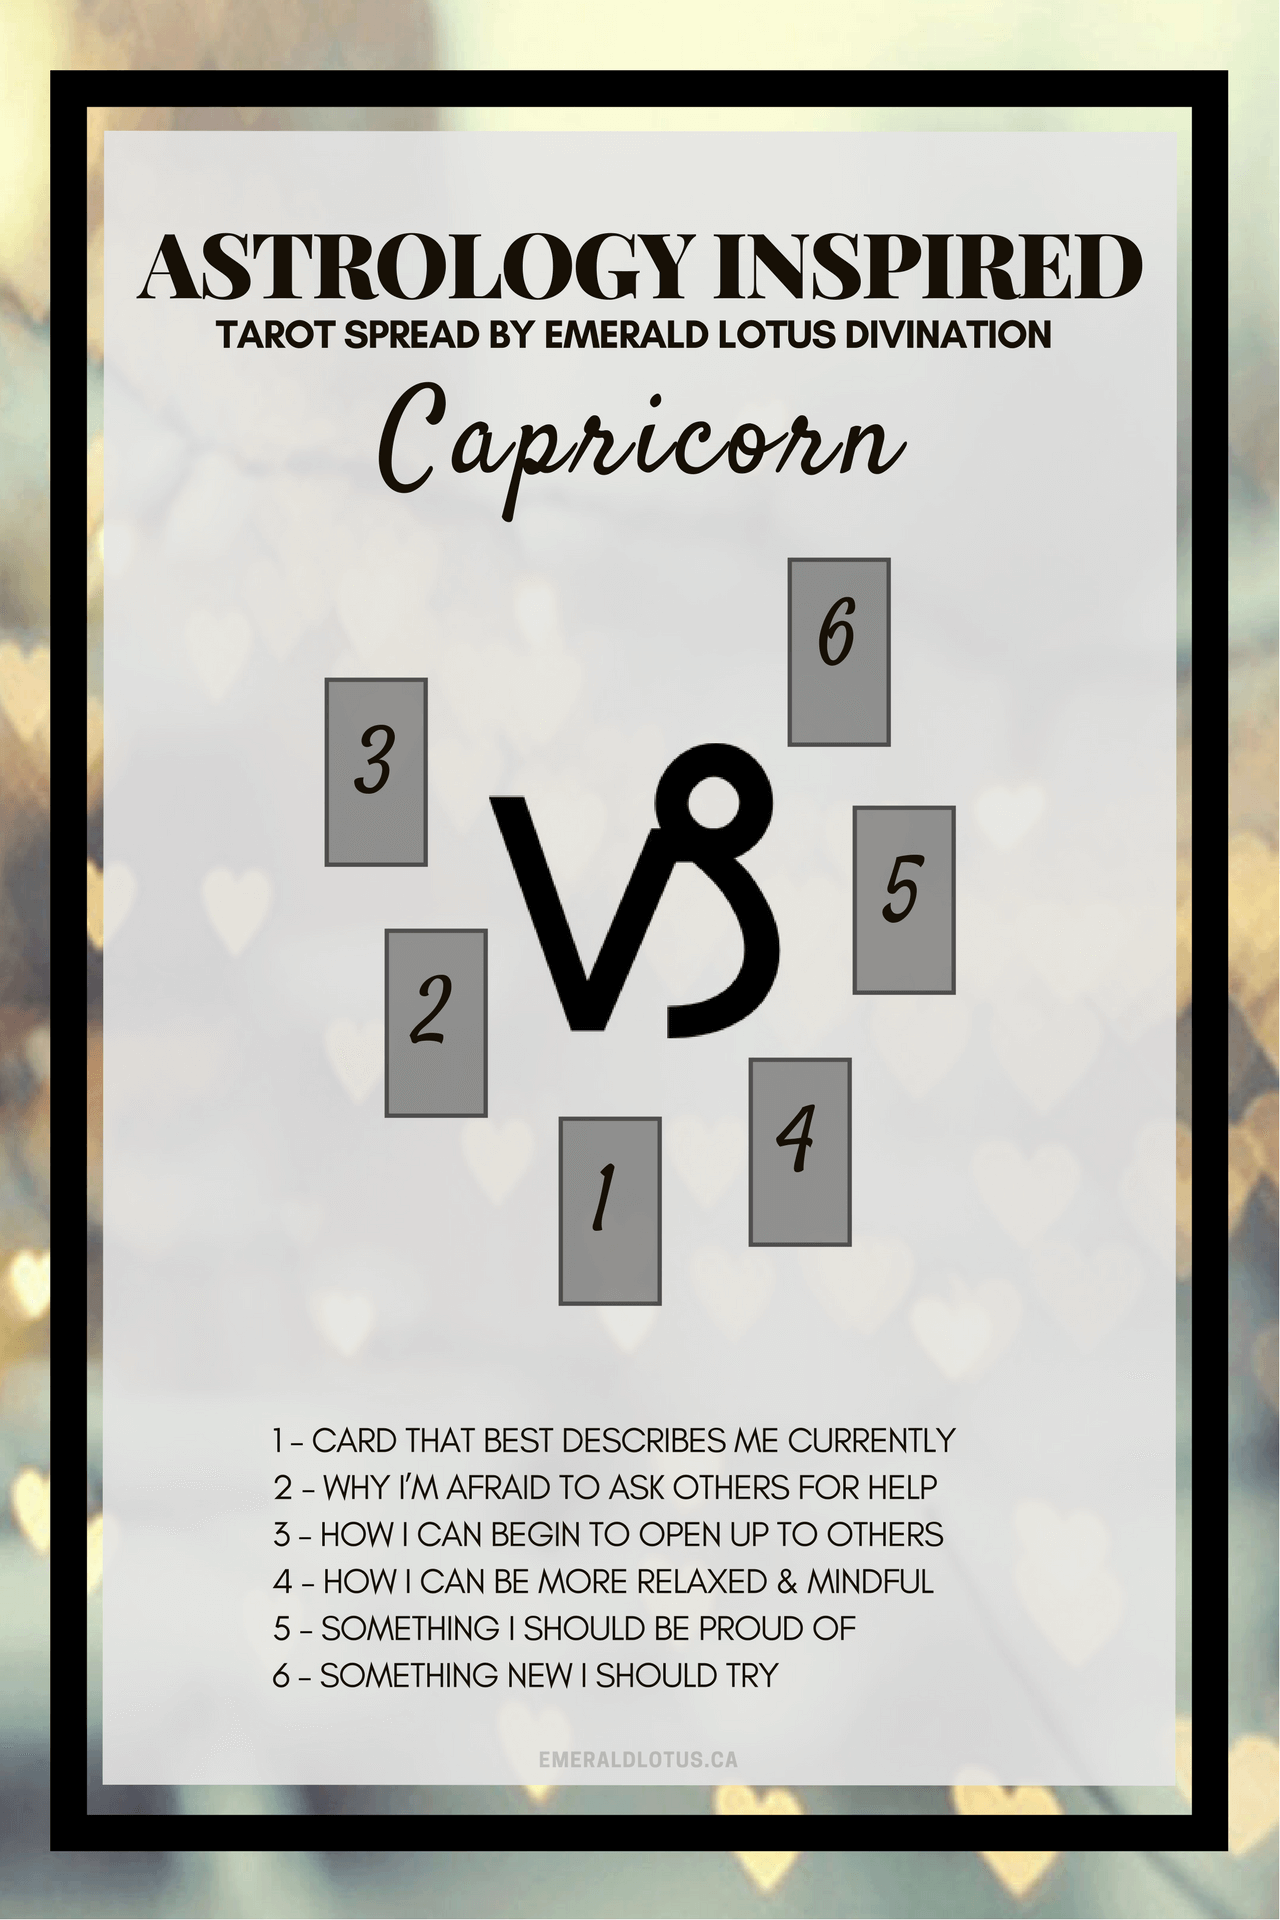 capricorn-tarot-spread-astrology-1.png